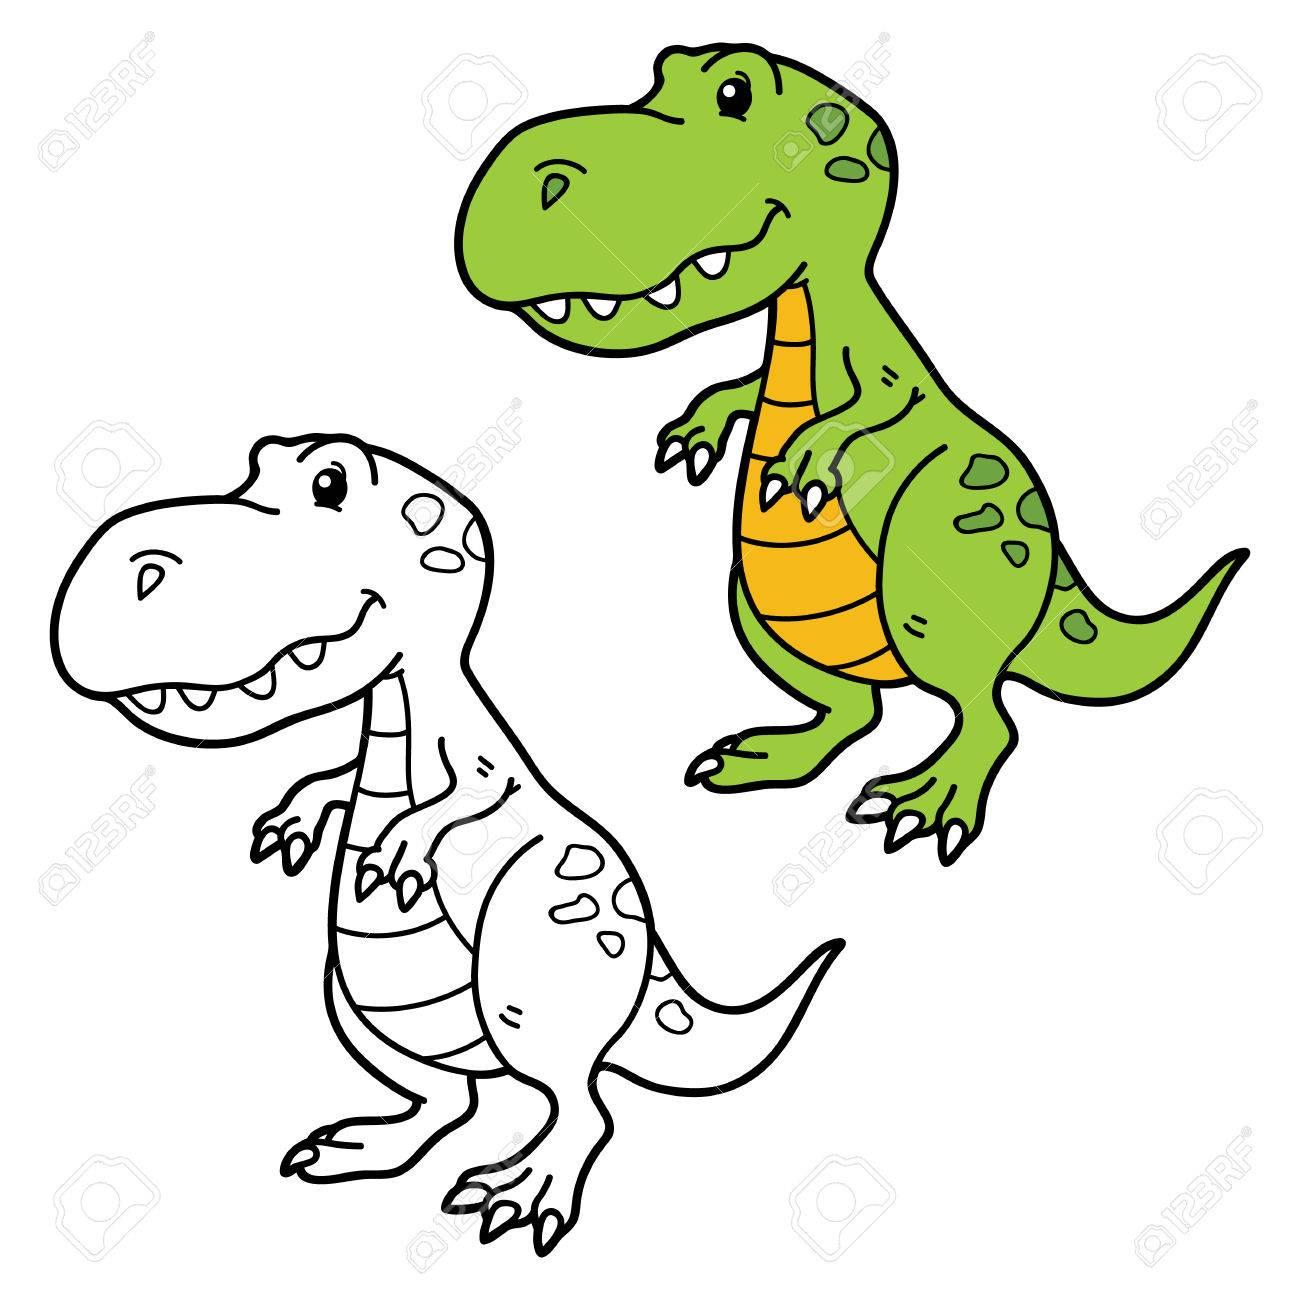 Increíble Dinosaurios Lindos Para Colorear Ornamento - Enmarcado ...